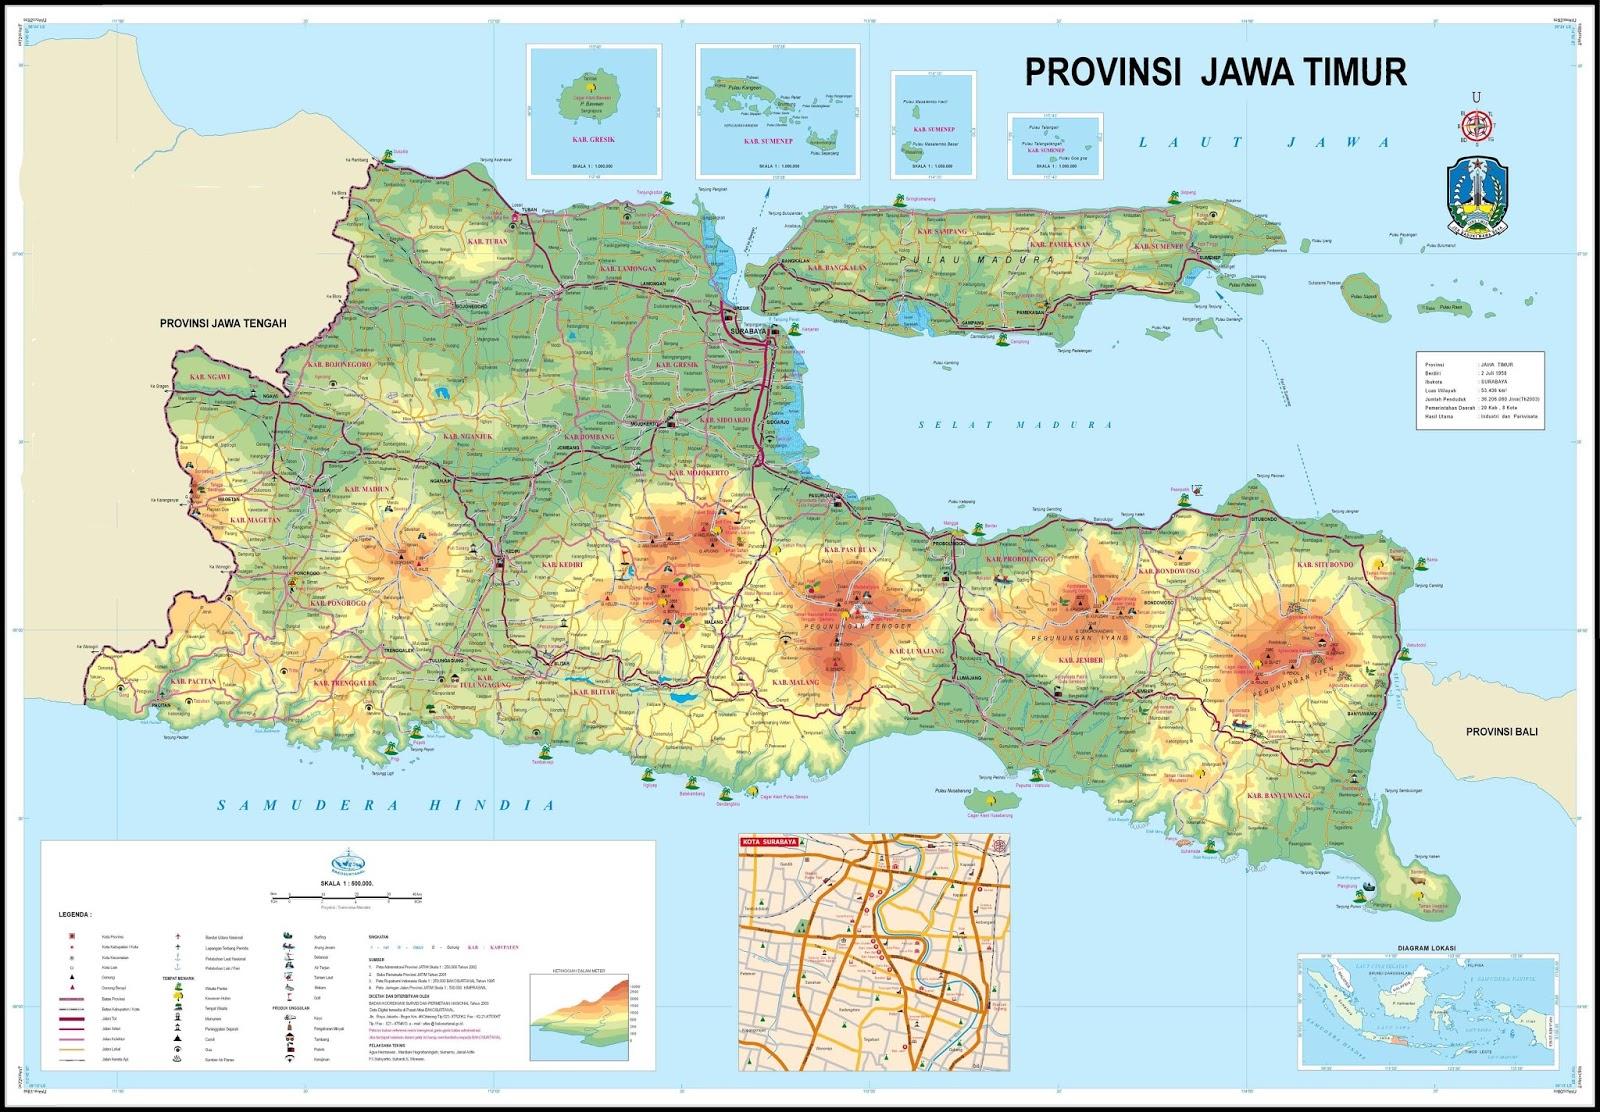 Peta Jawa Timur Lengkap Daftar 29 Nama Kabupaten 9 Kota